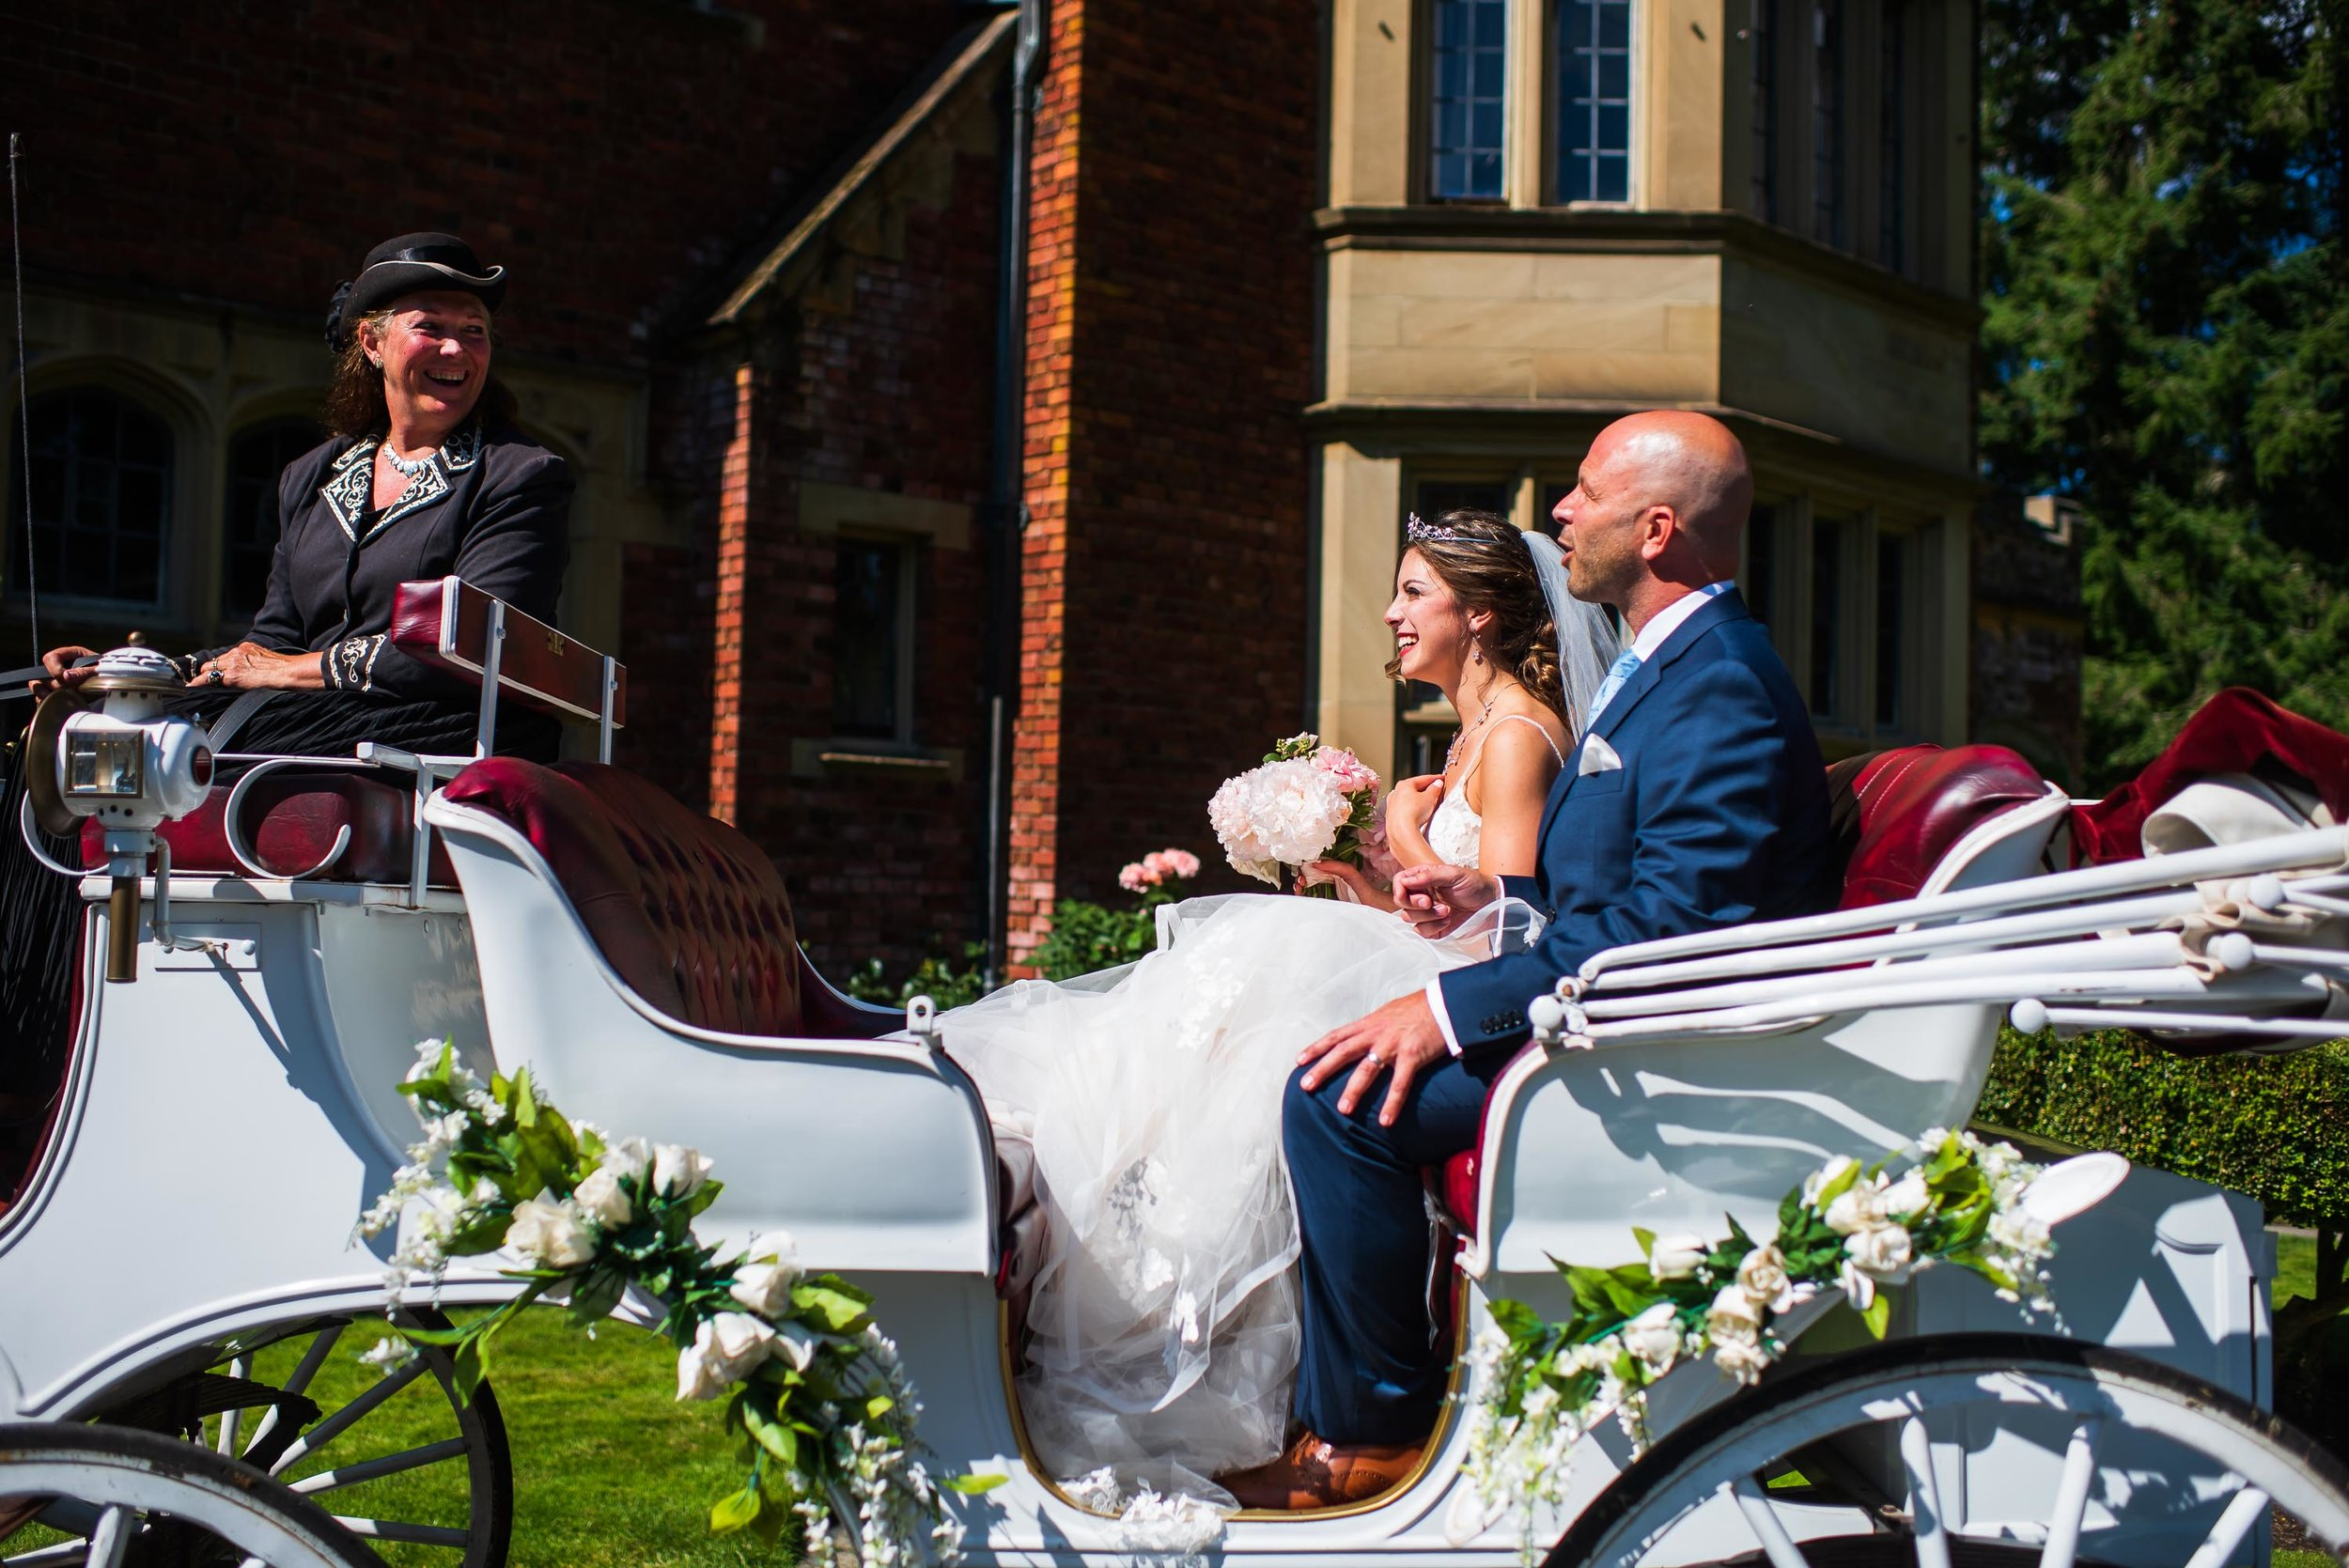 thornewood castle wedding 43.jpg